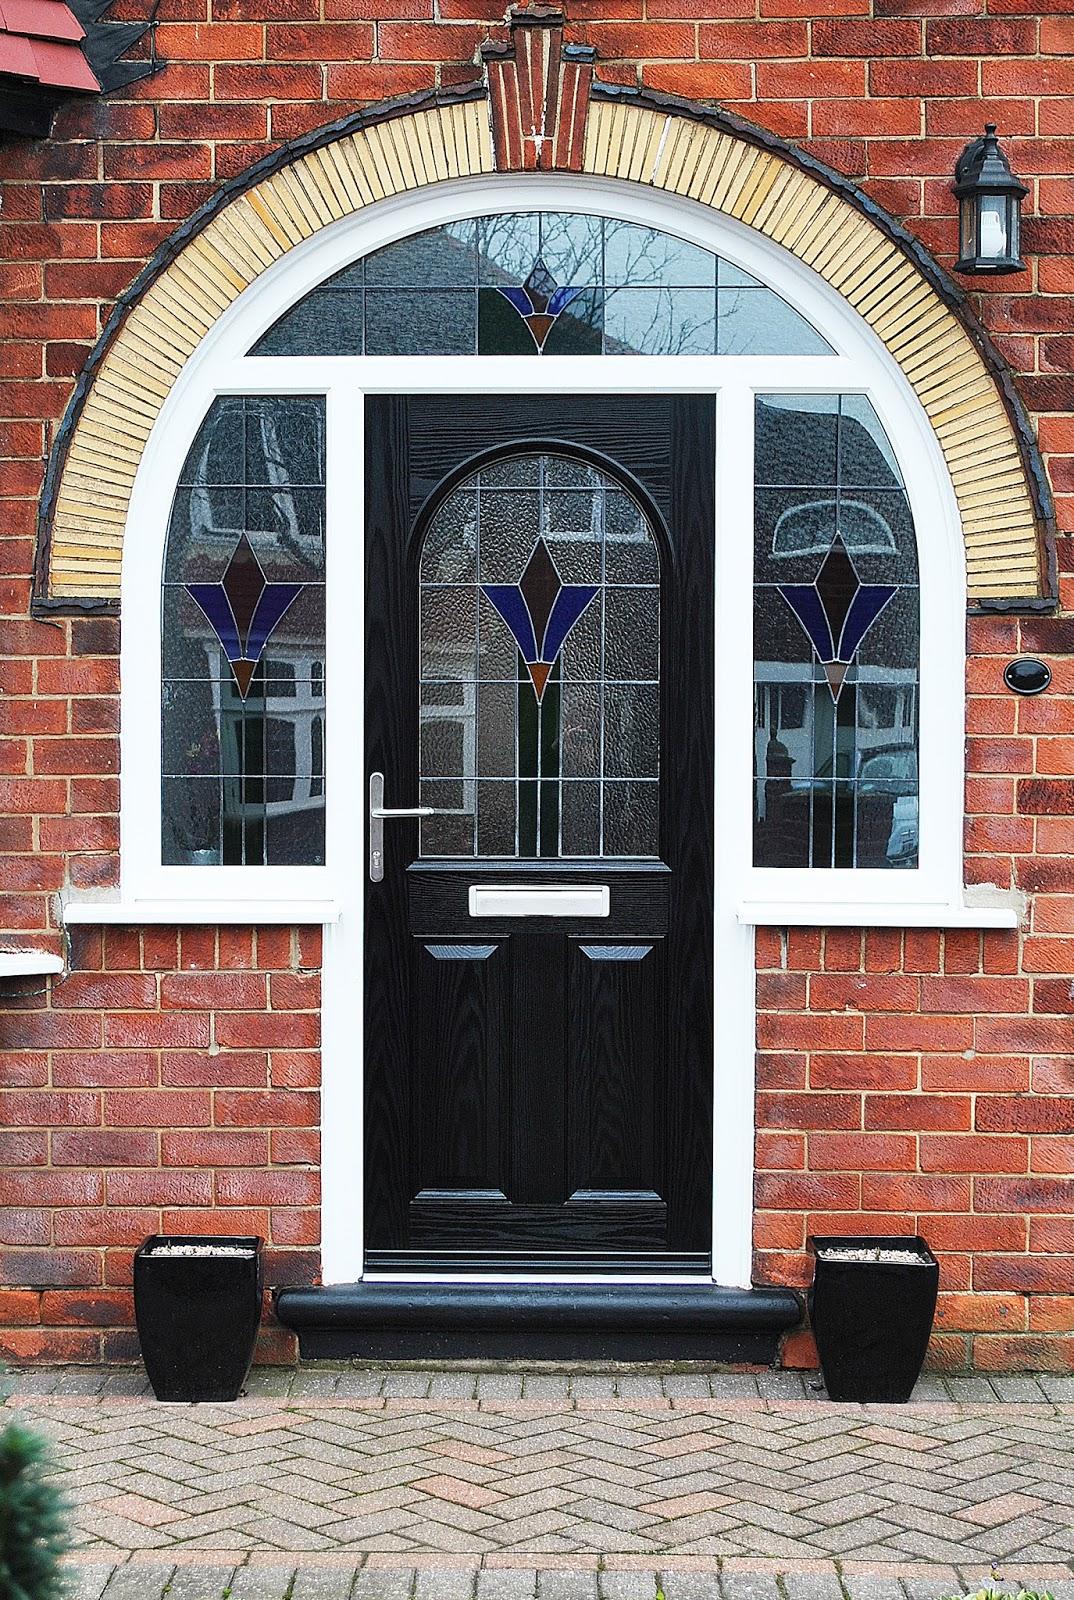 Beautiful house of upvc rehau windows composite doors for Composite windows